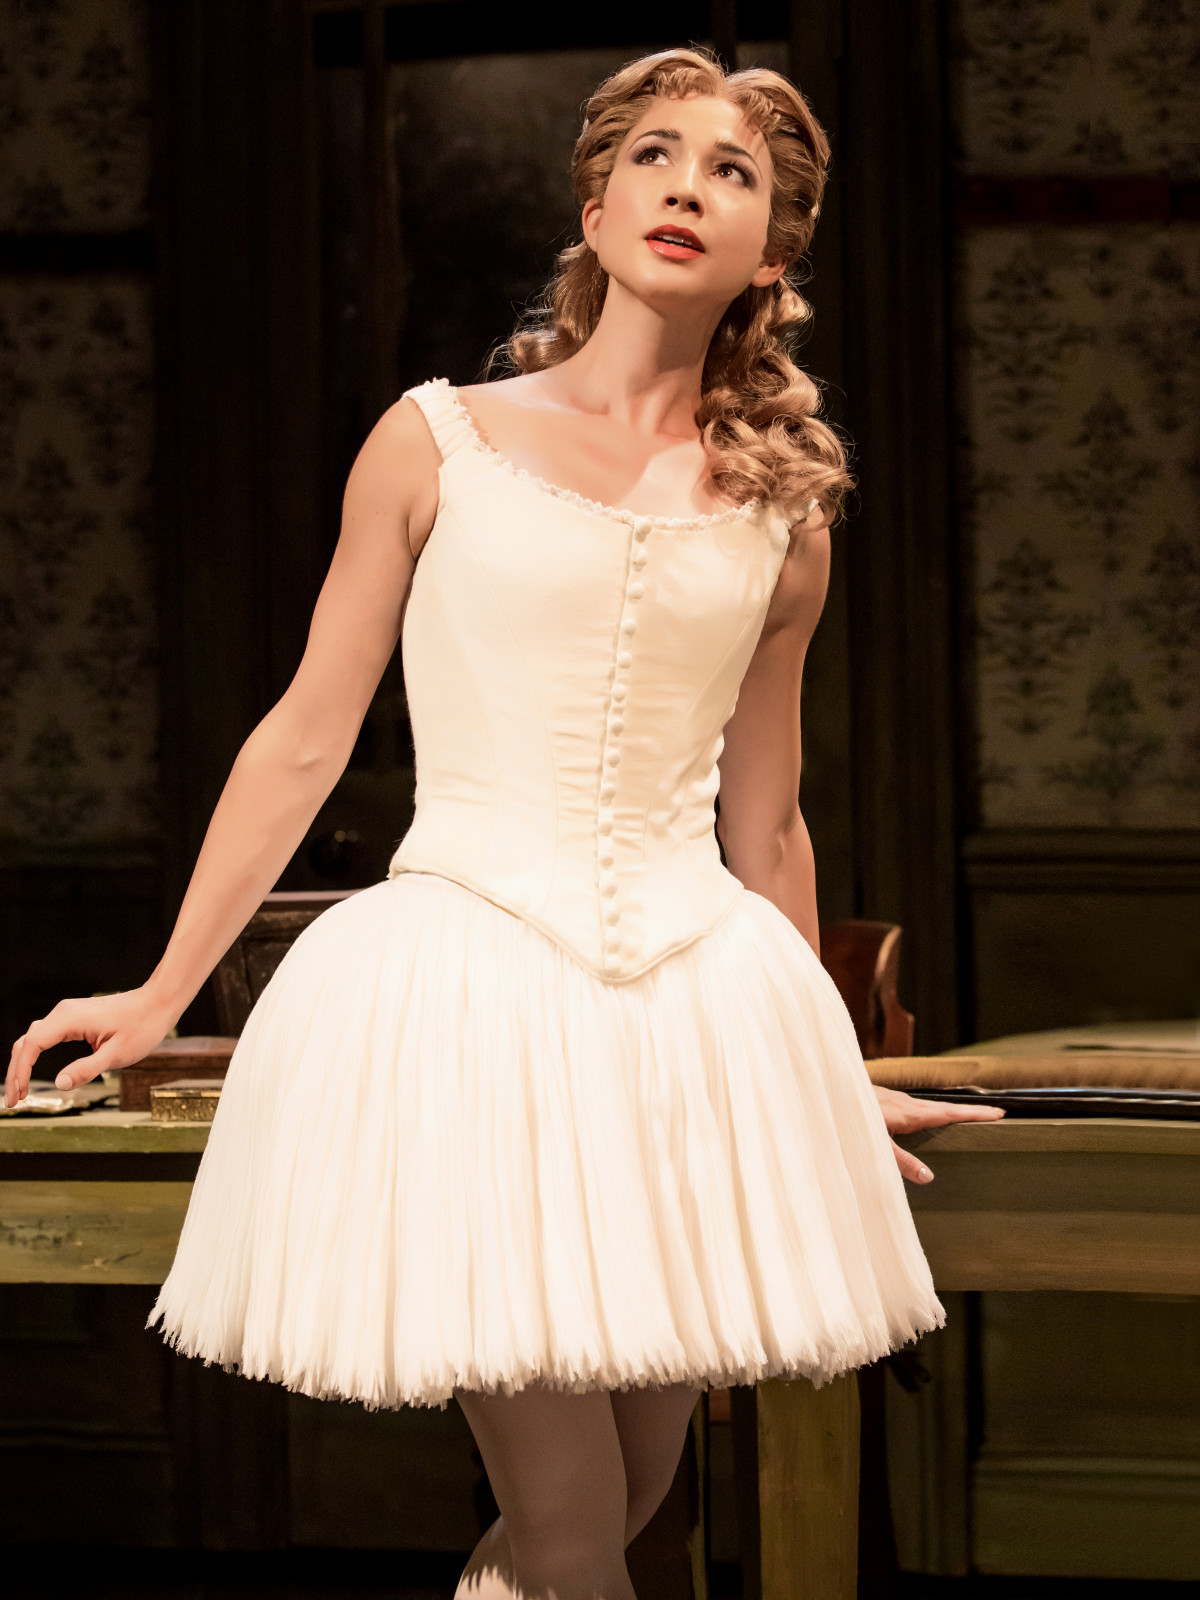 Phantom of the Opera: Emily Ramirez